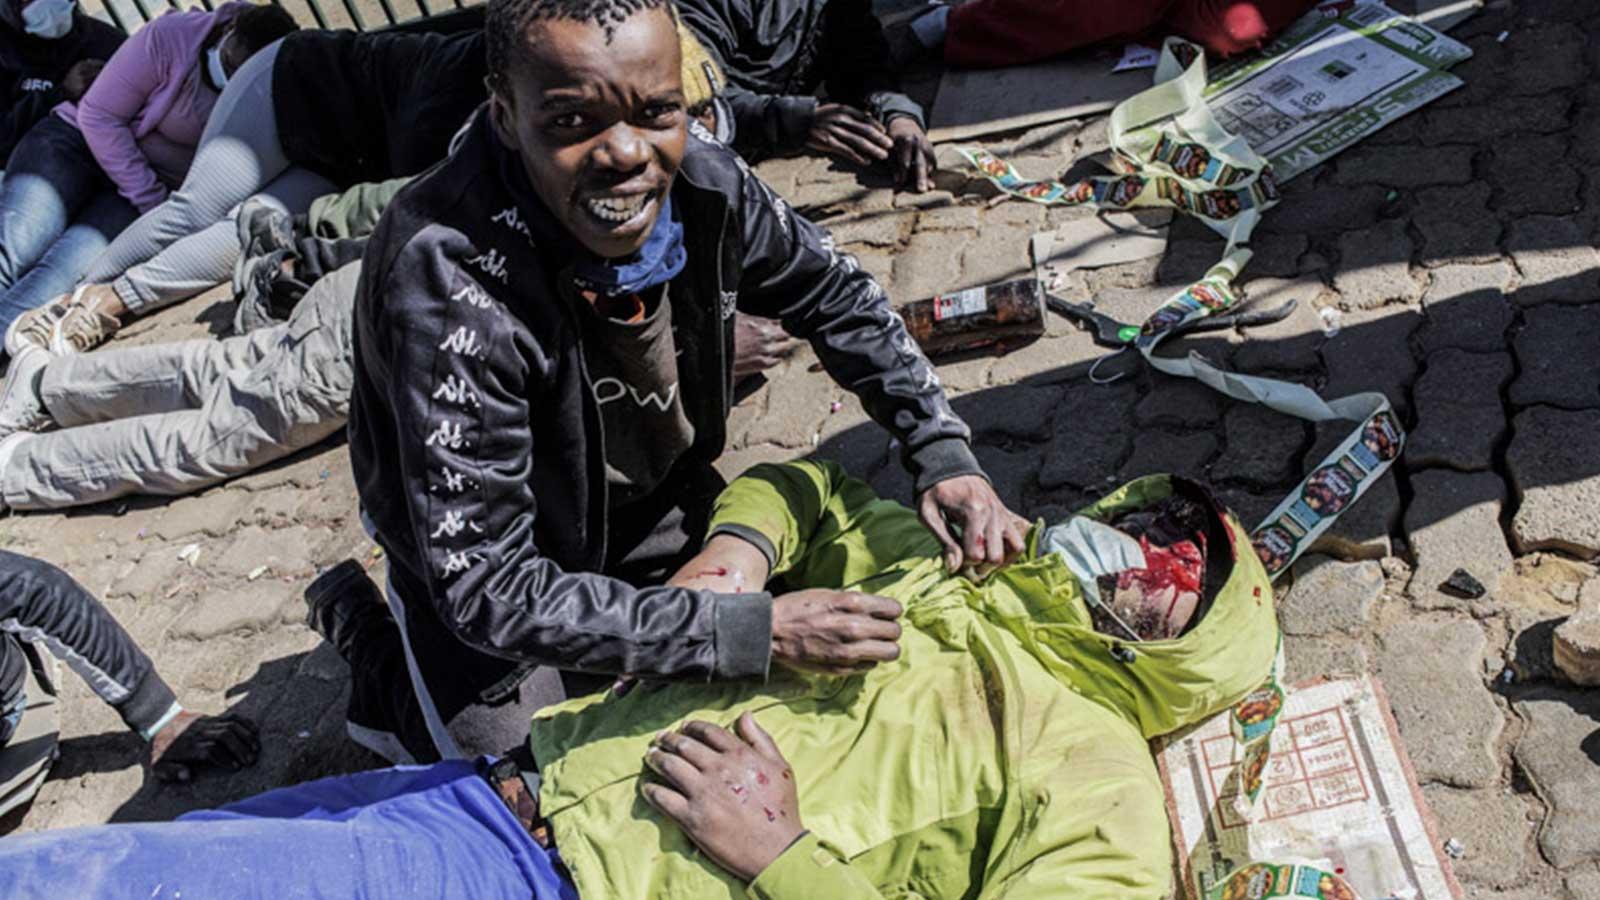 South Africa in turmoil: Man injured